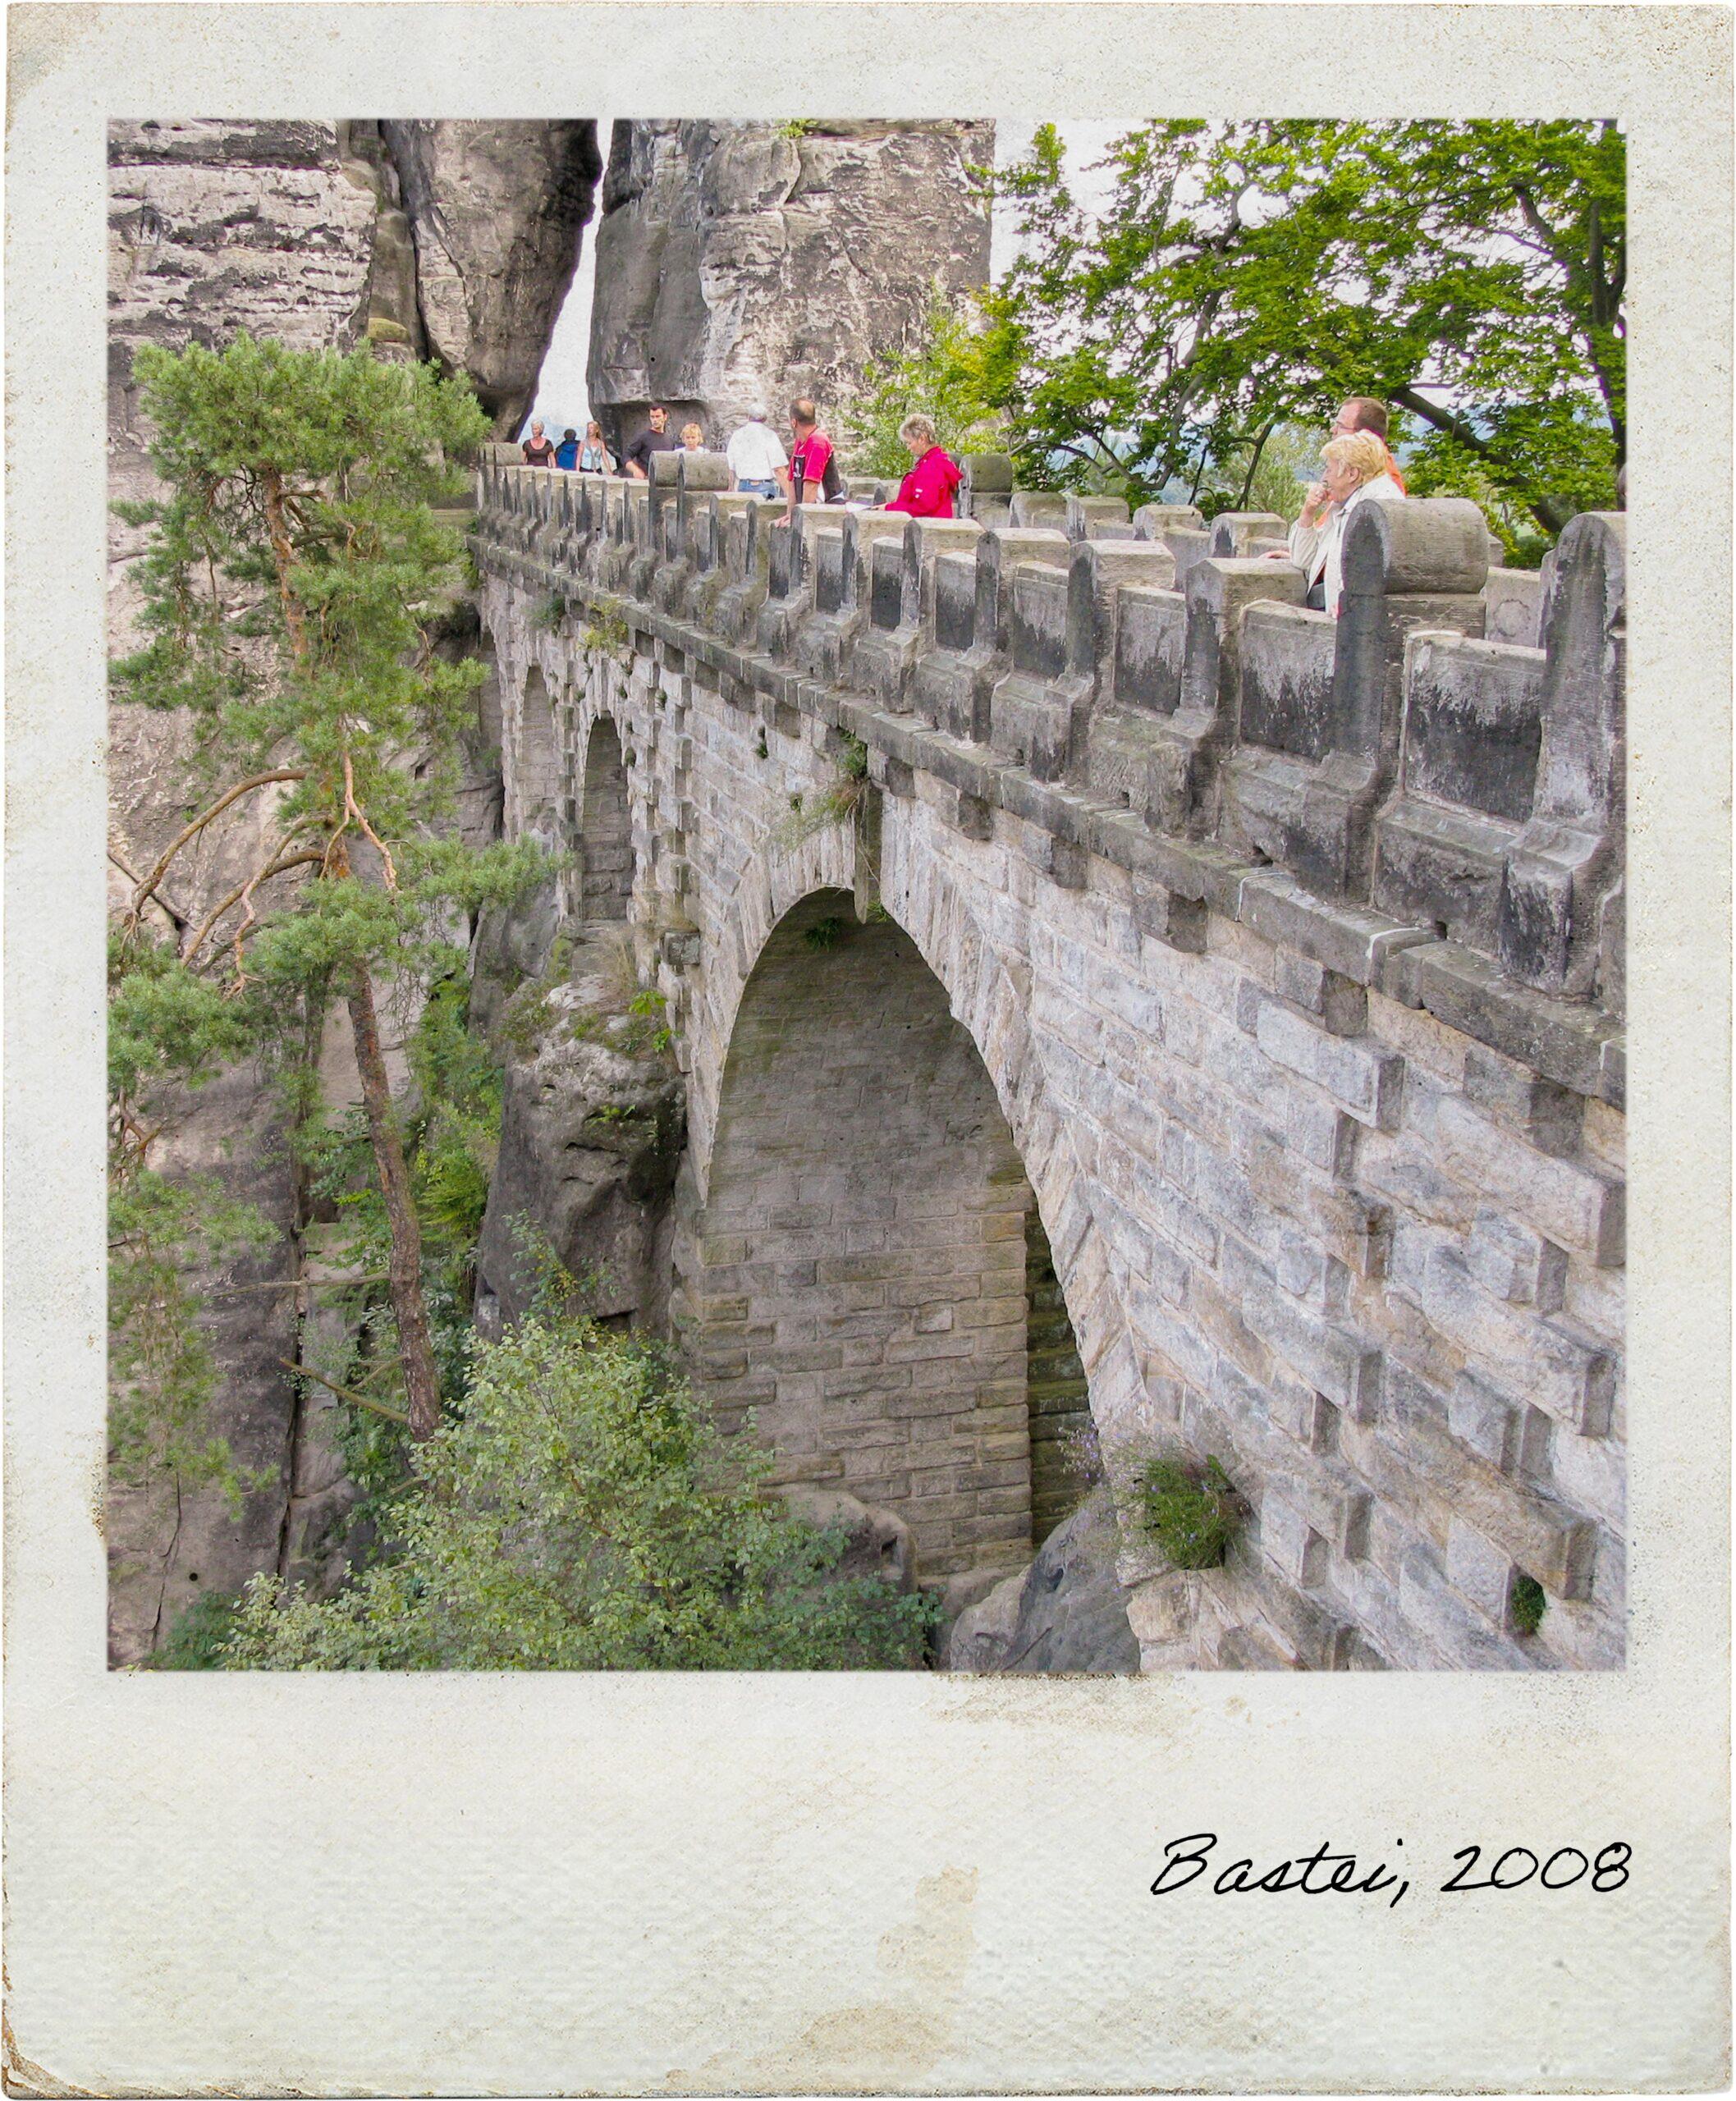 Ponte Bastei